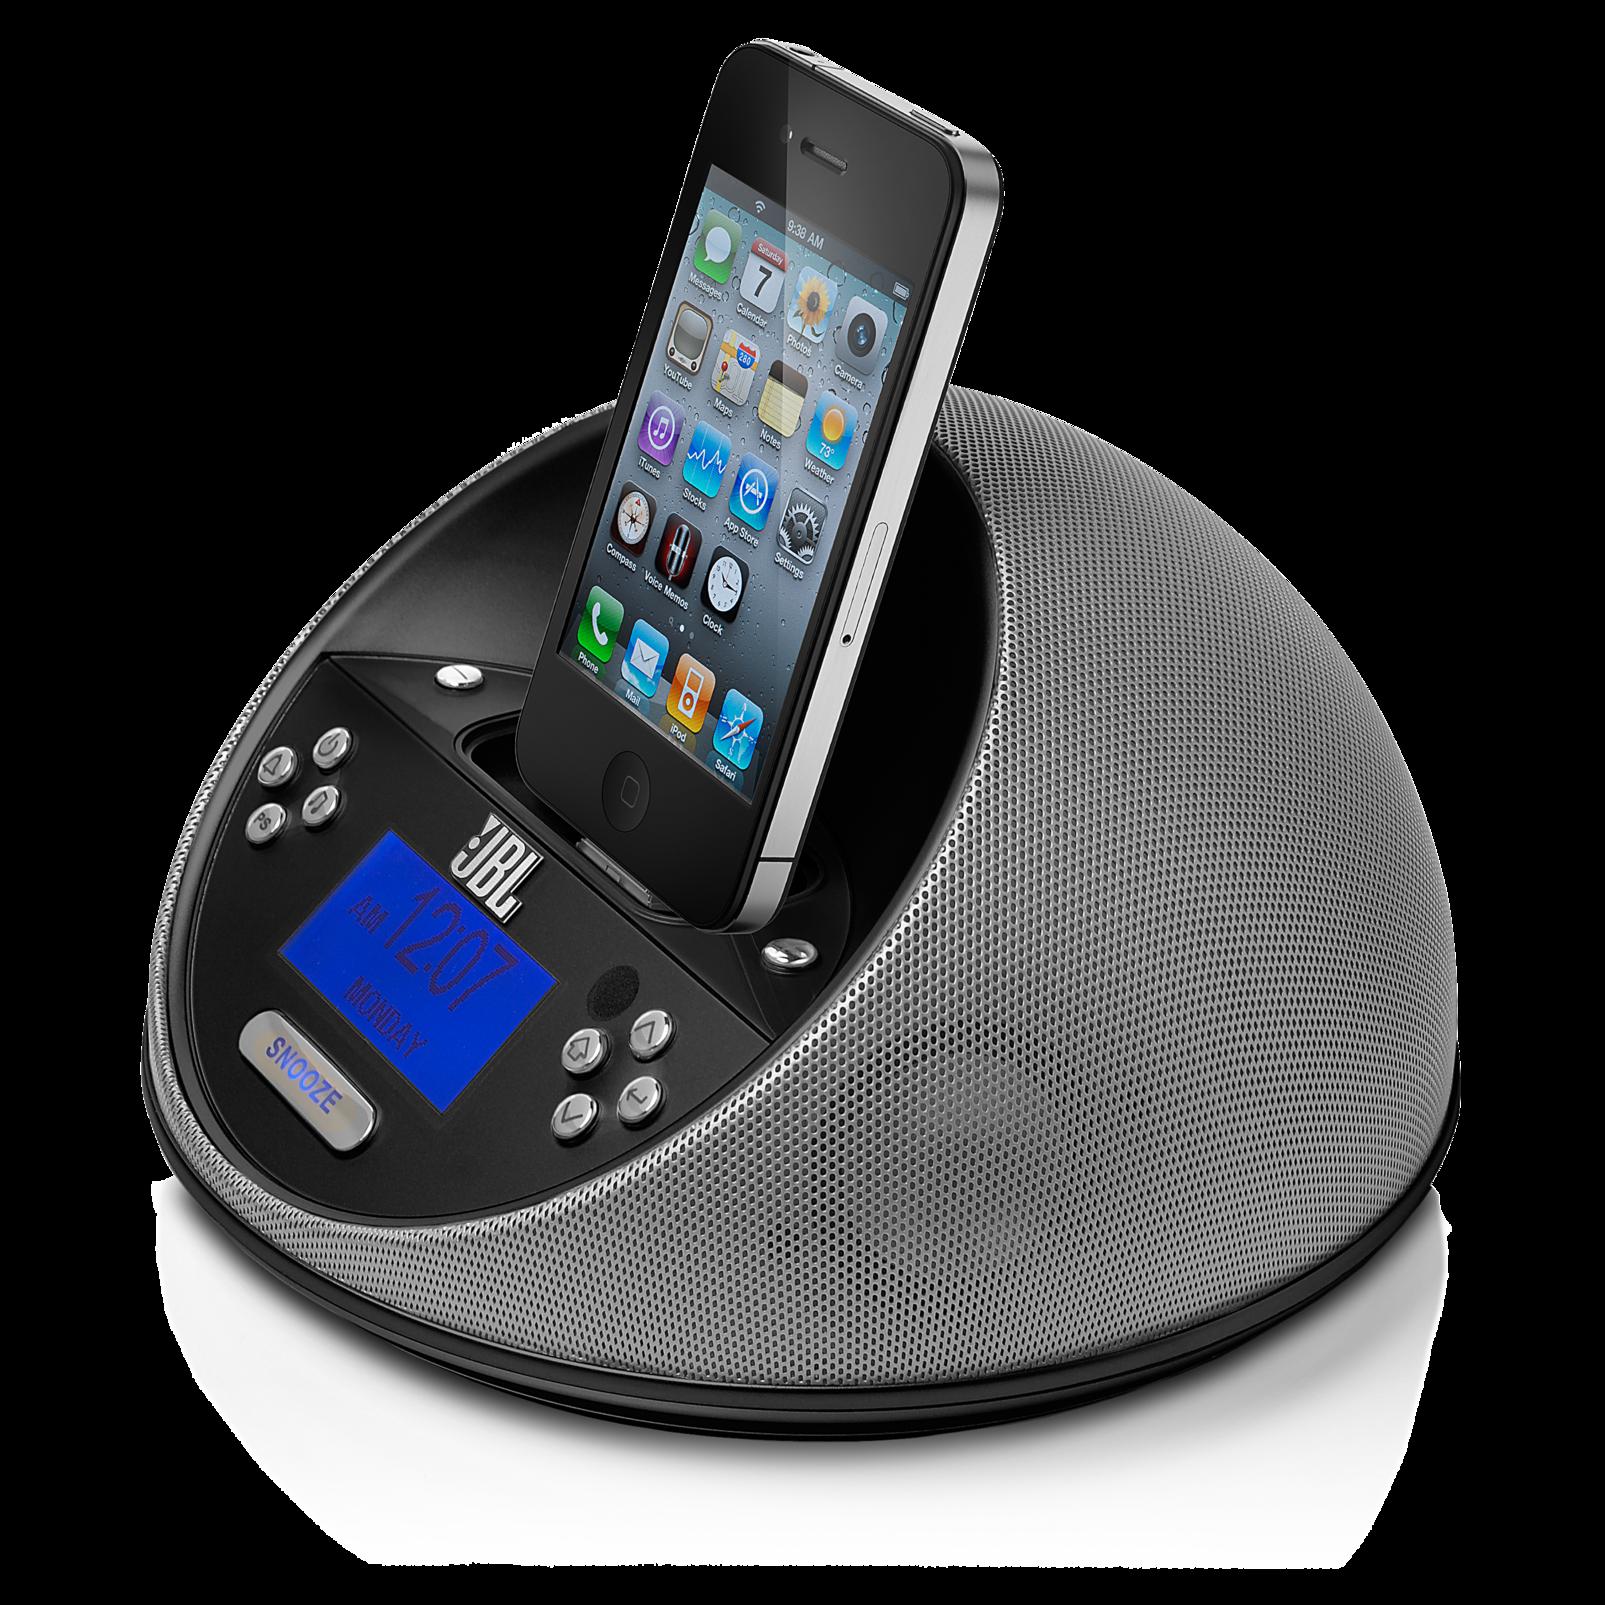 jbl on time micro loudspeaker dock and clock radio rh jbl com JBL S38II JBL Speaker Dock iPhone 5